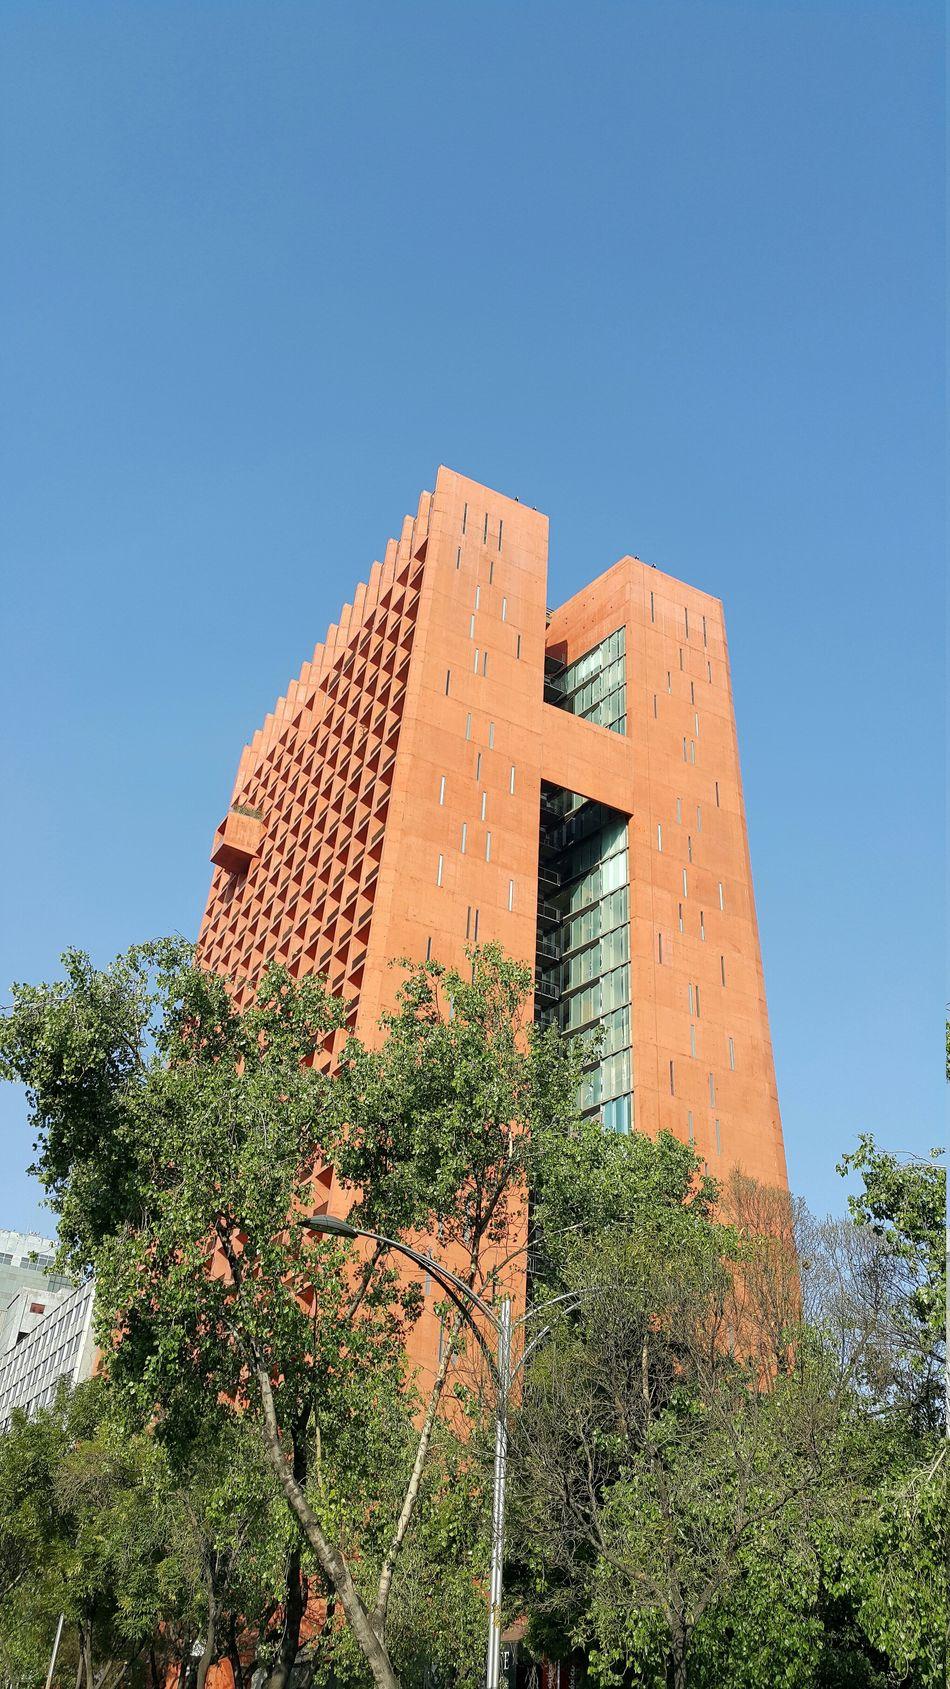 Reforma 27 Alberto Kalach Mexico City Architectureporn